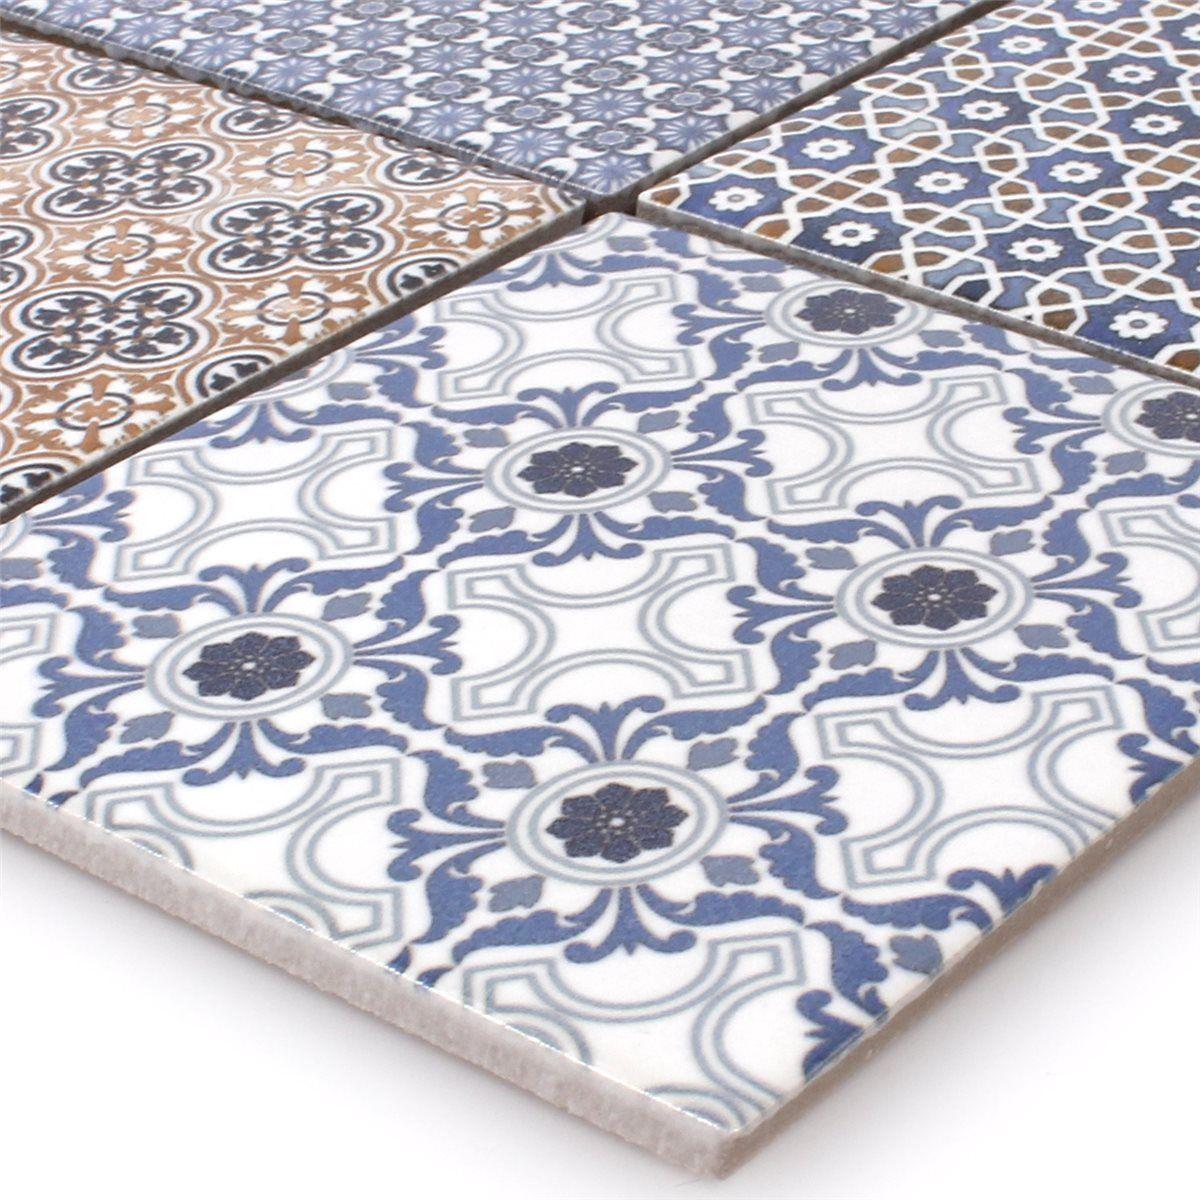 Mosaikfliesen Keramik Zement Optik Classico | Badezimmer Ideen ...